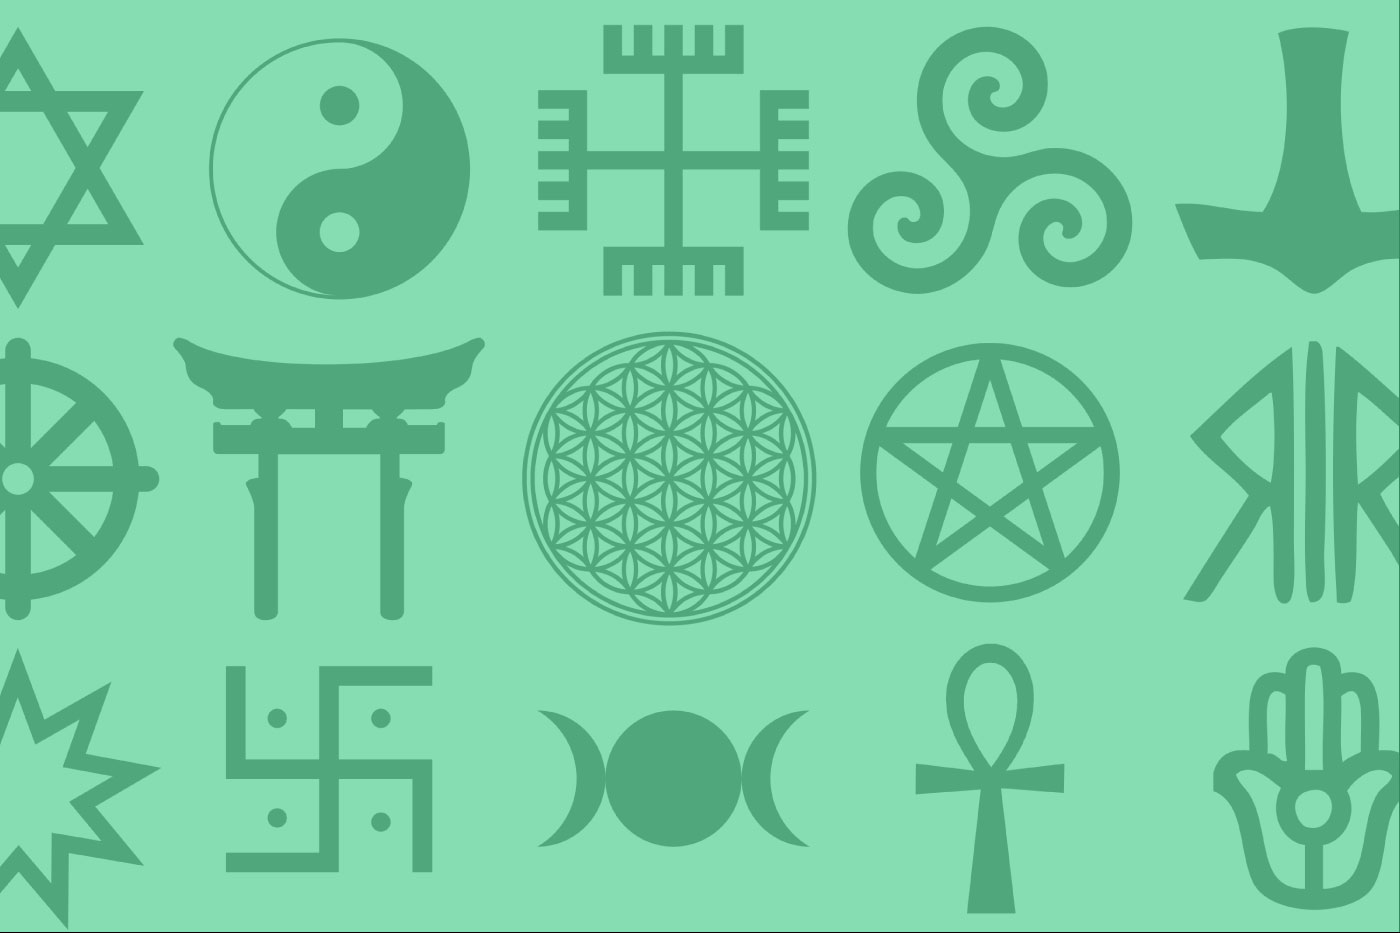 Symbols Blogpost